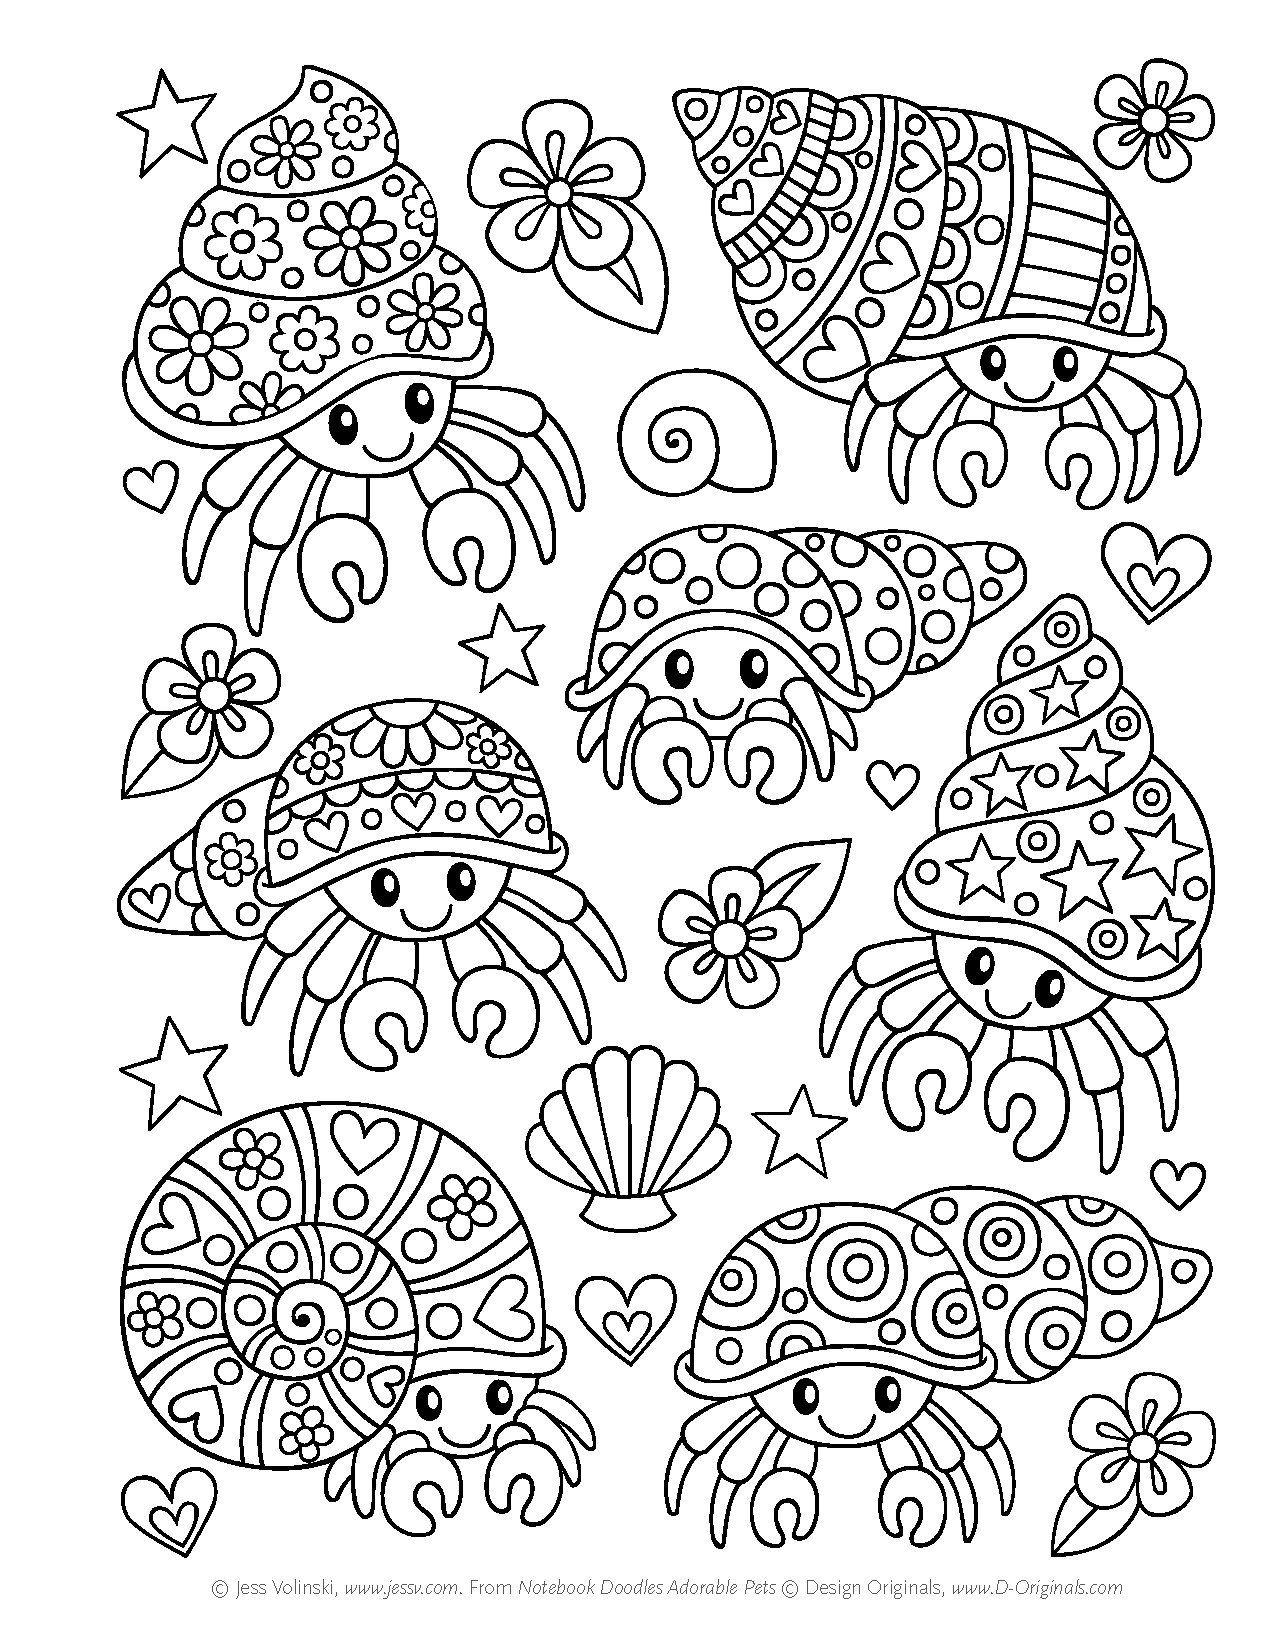 Notebook Doodles Adorable Pets Coloring